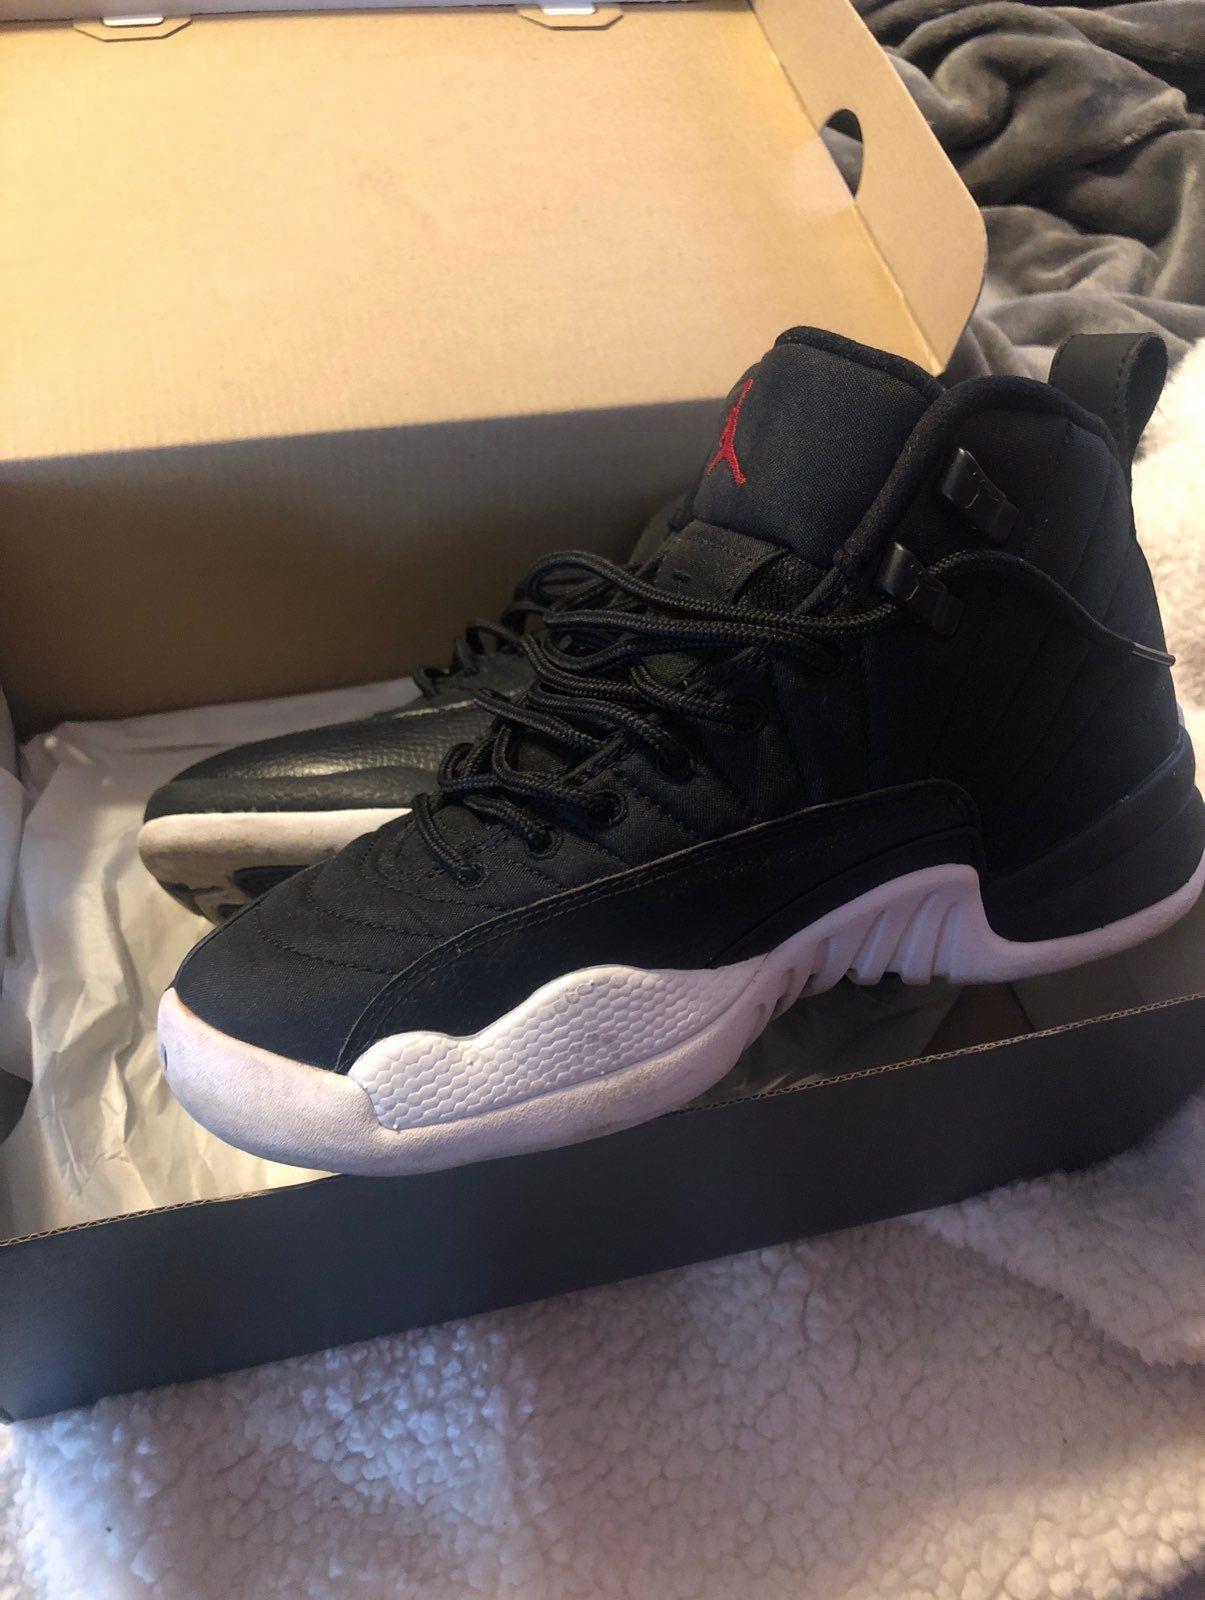 Shoes sneakers jordans, Jordans